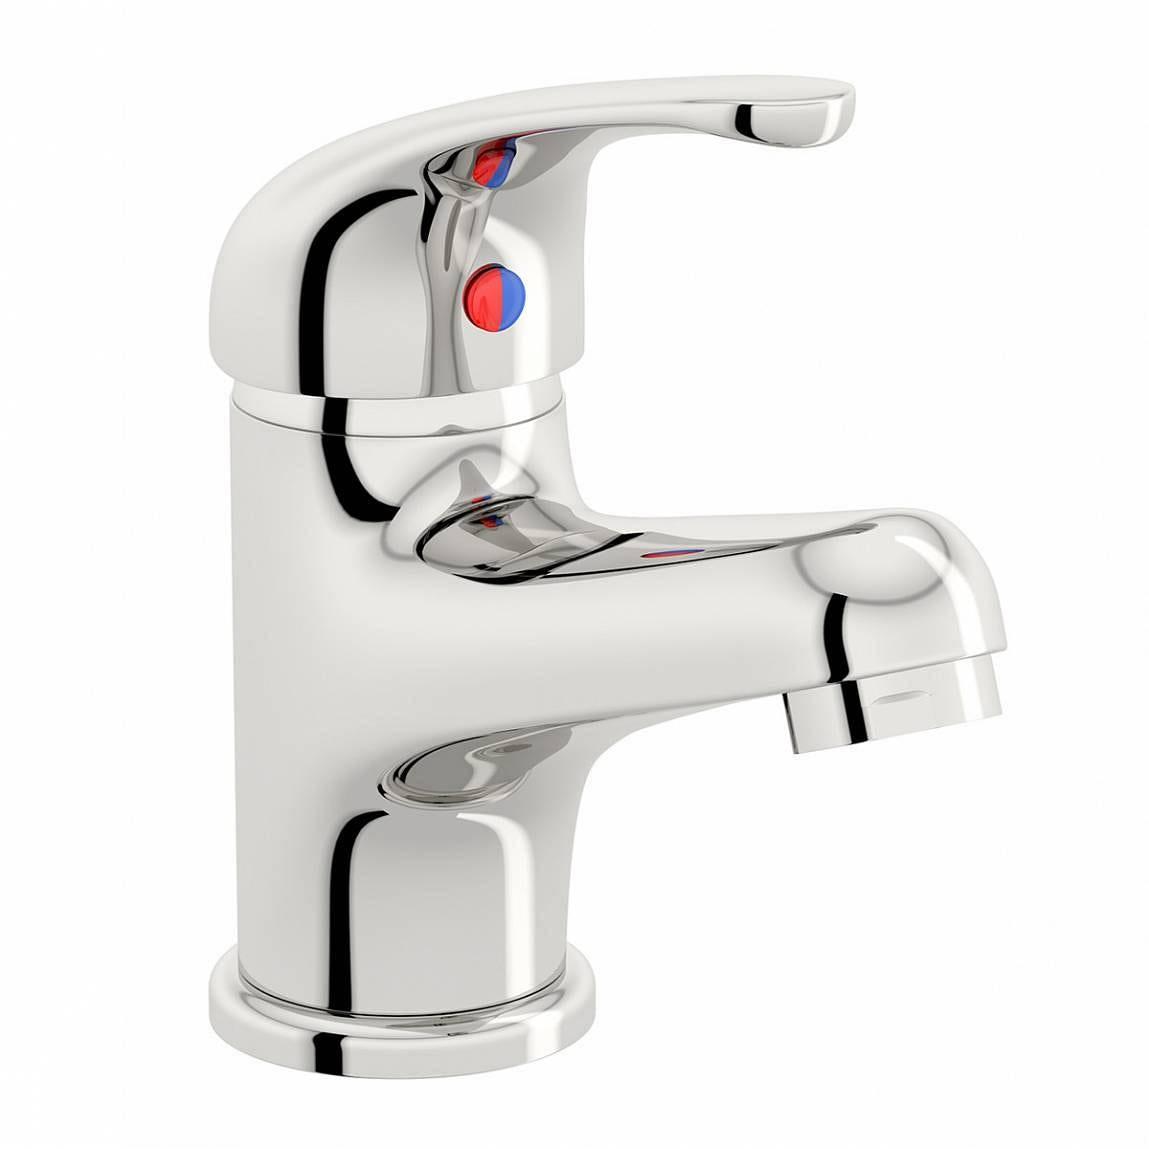 Clarity cloakroom basin mixer tap